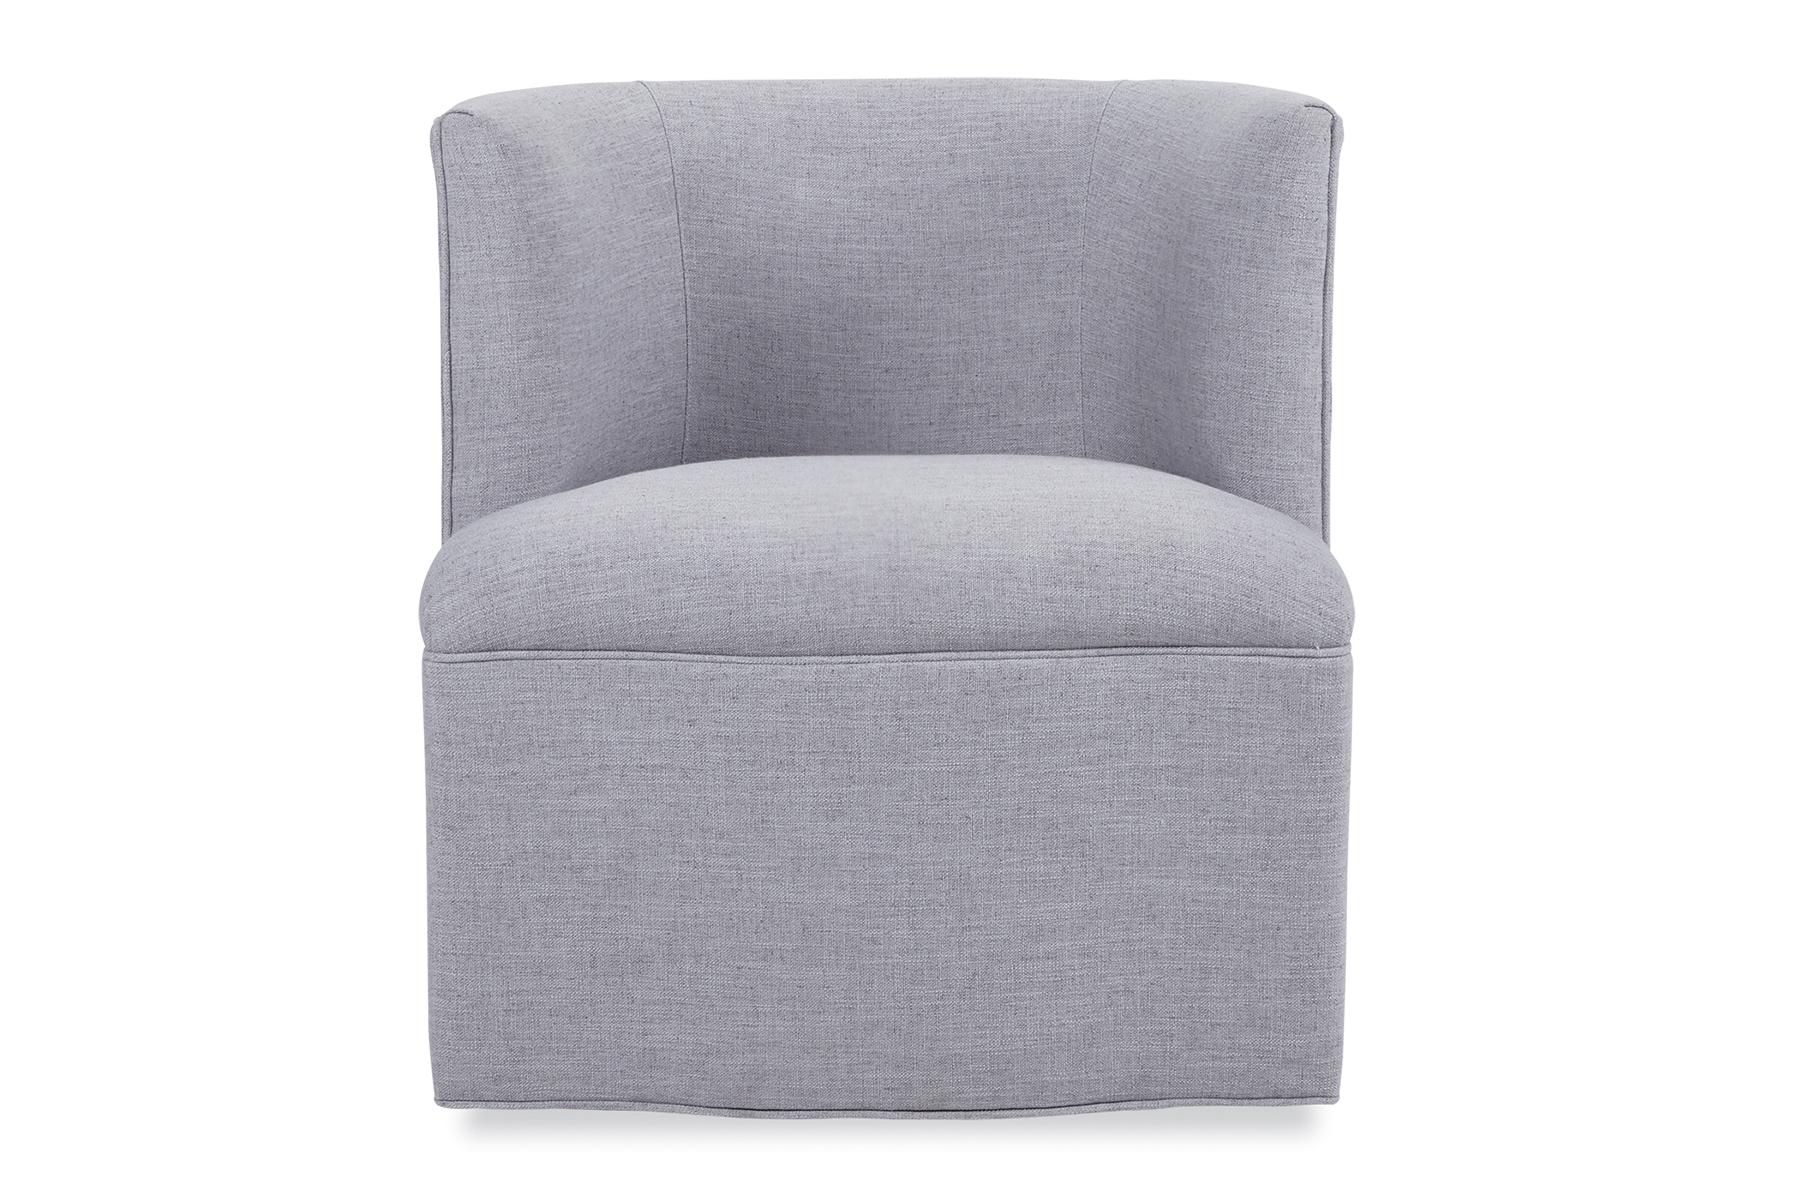 swivel chairs living room design ideas grey carpet petite barrel chair chaises chaddock co robb stucky